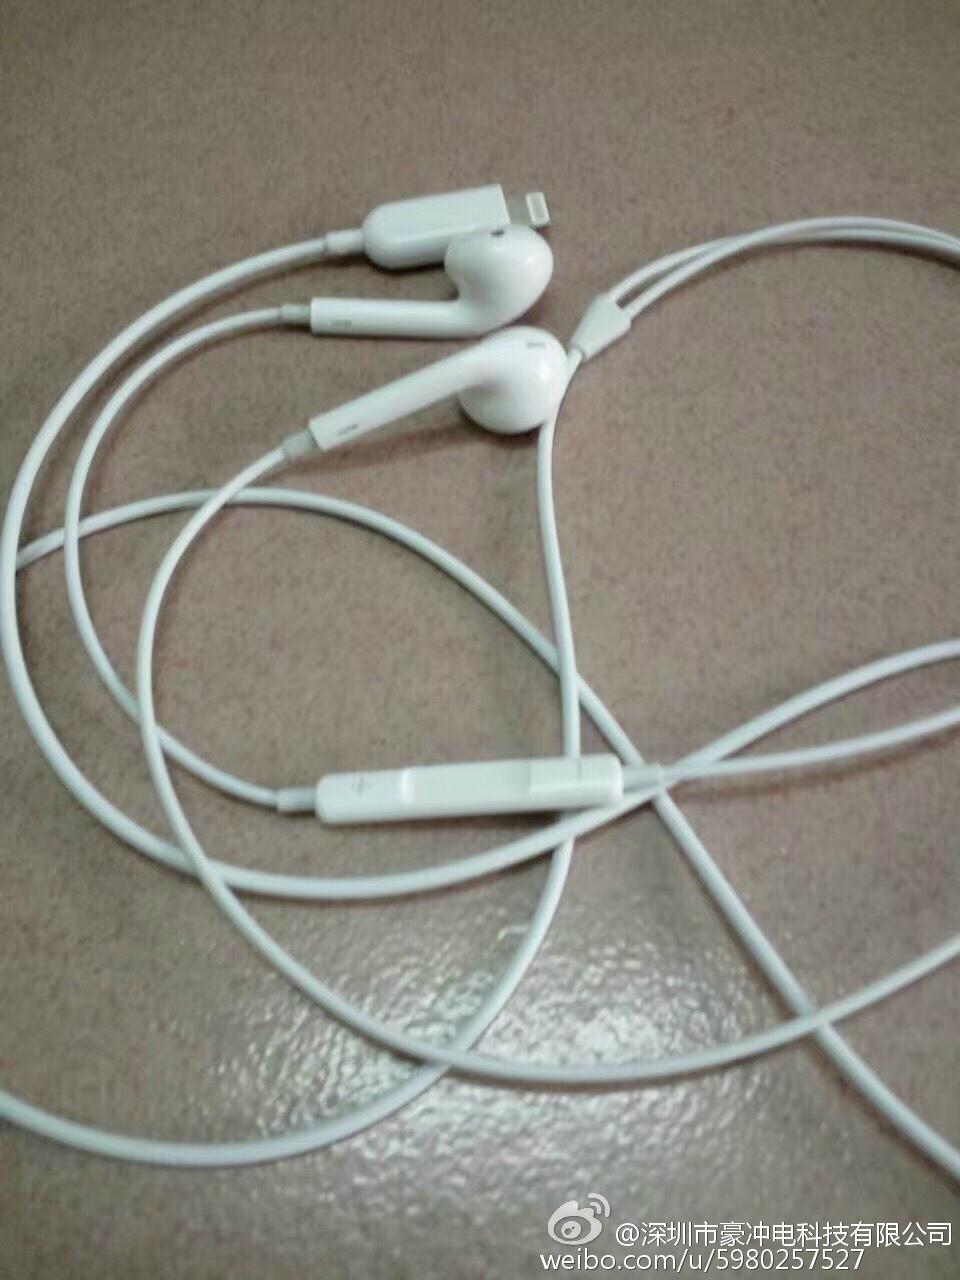 iphone-7-lightning-earpods-leak-1